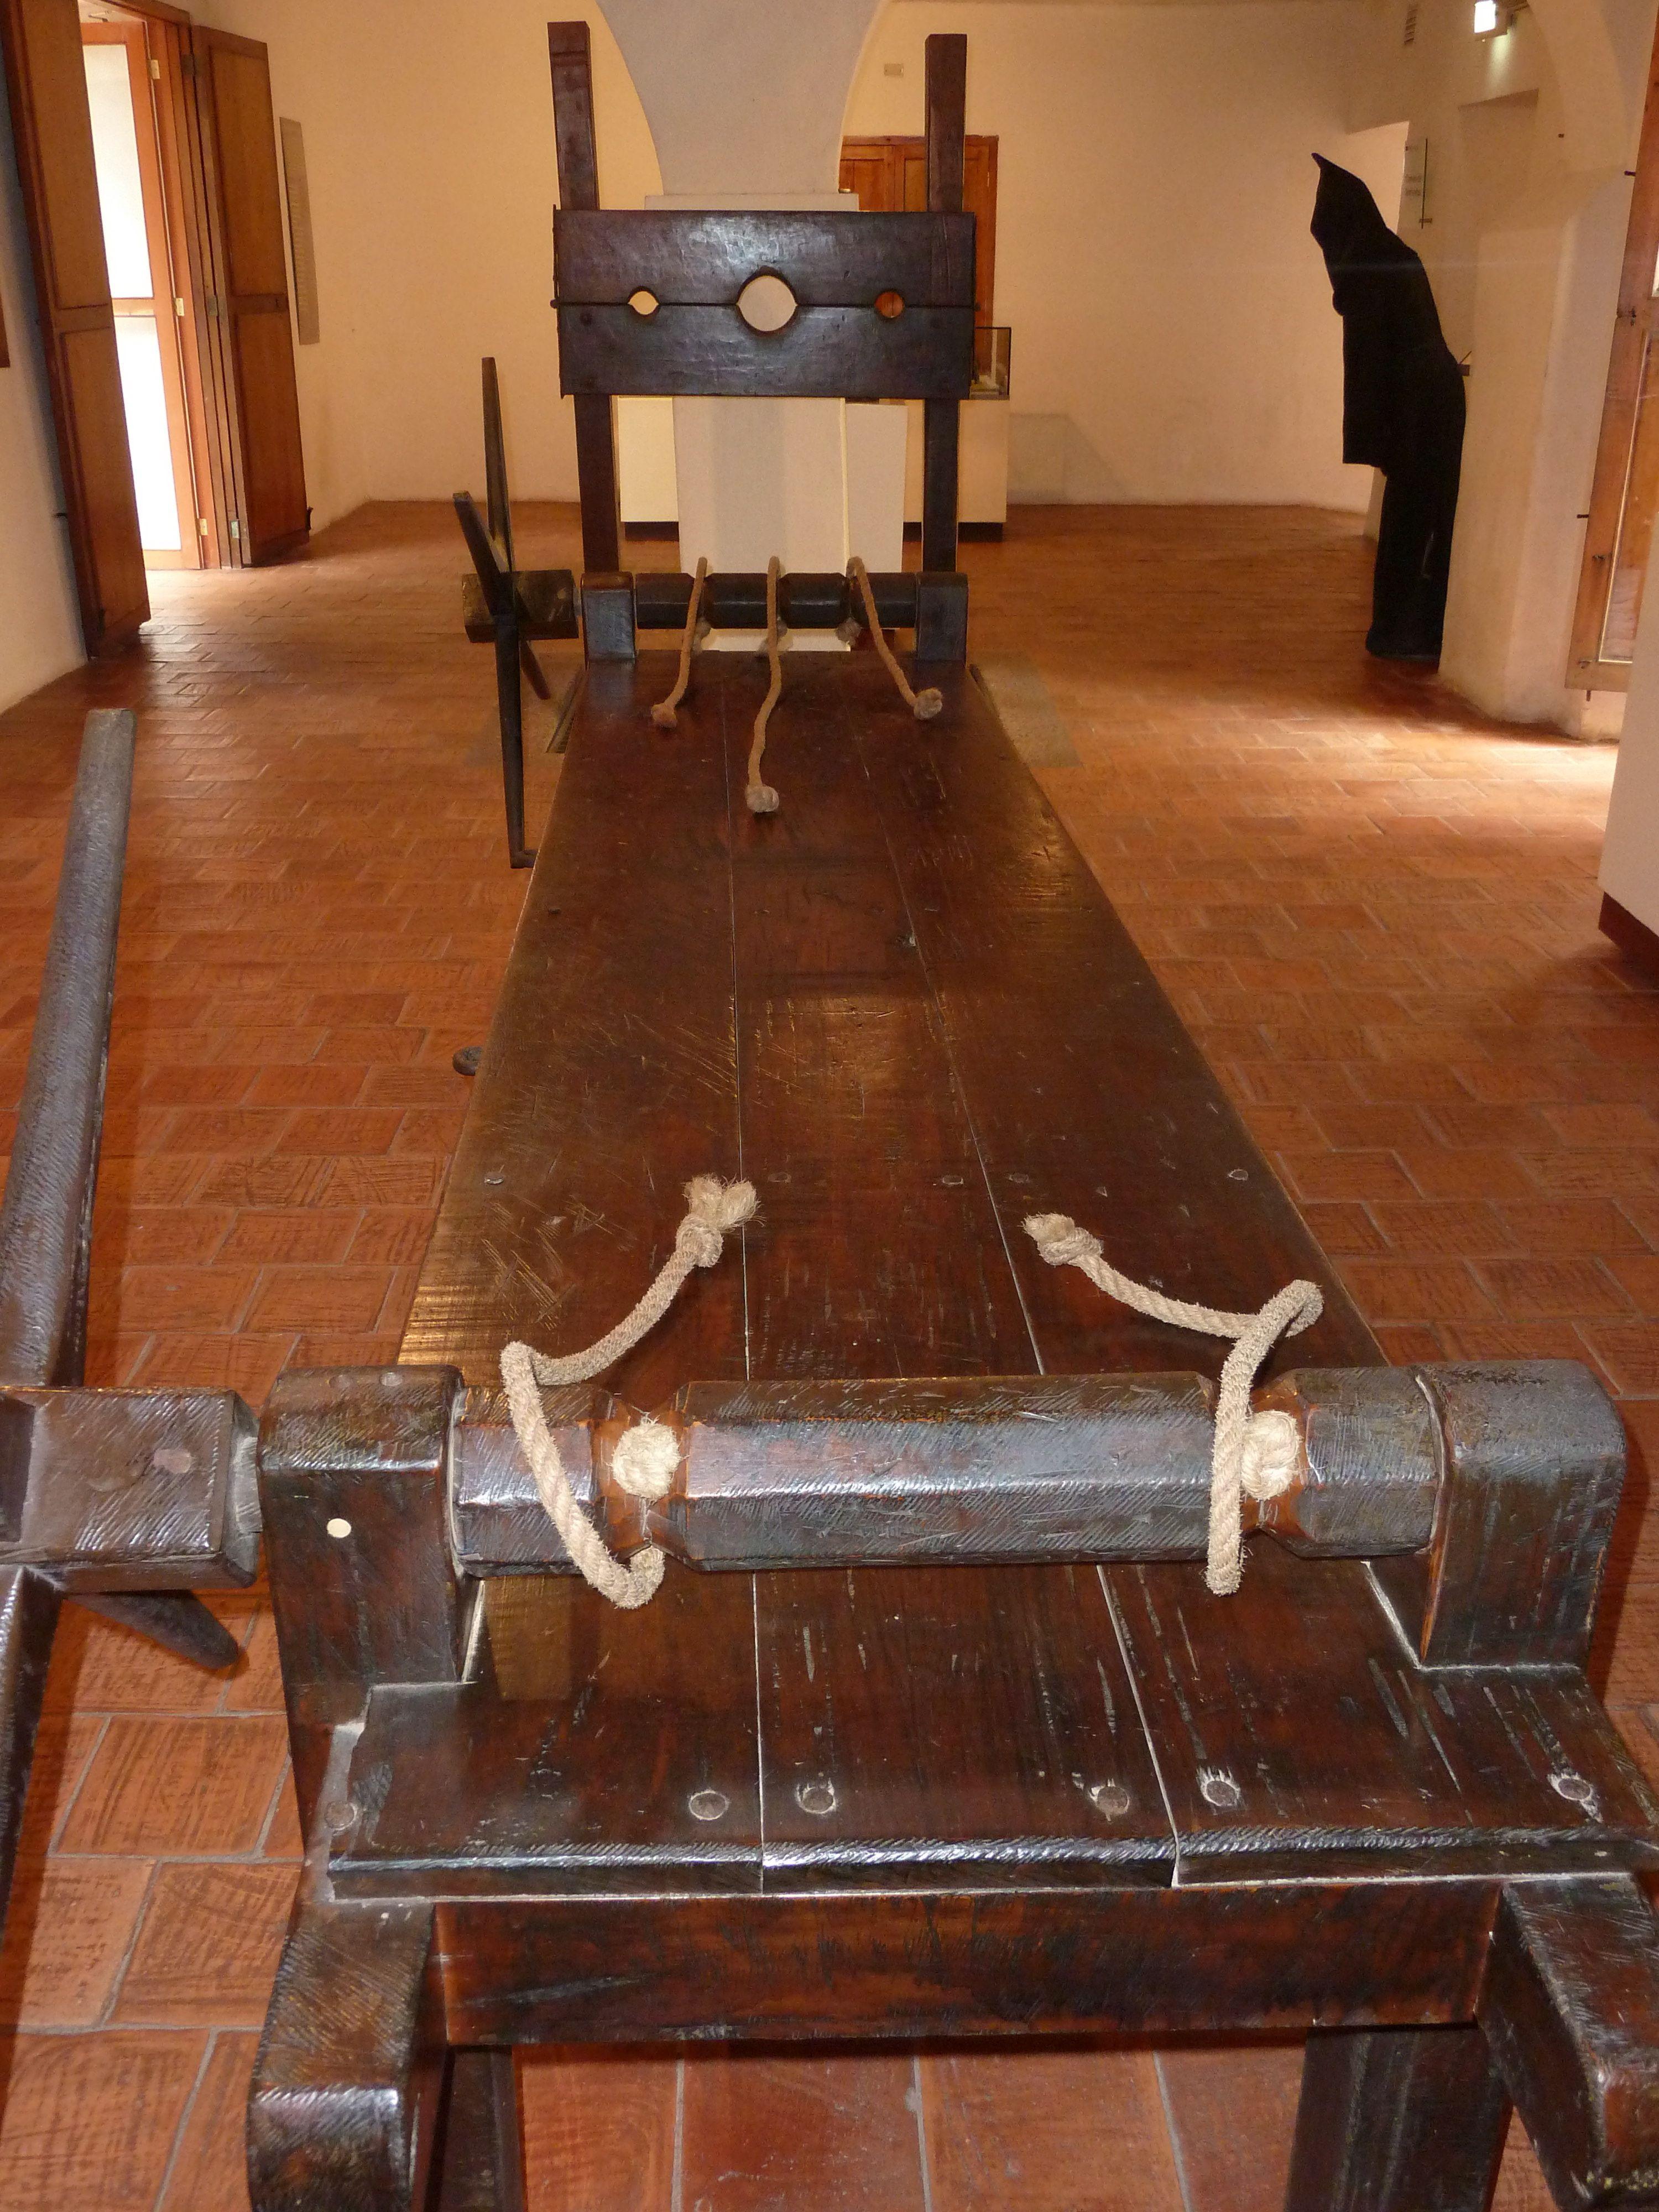 Bdsm medieval torture stories, fuck amateur teen orgy